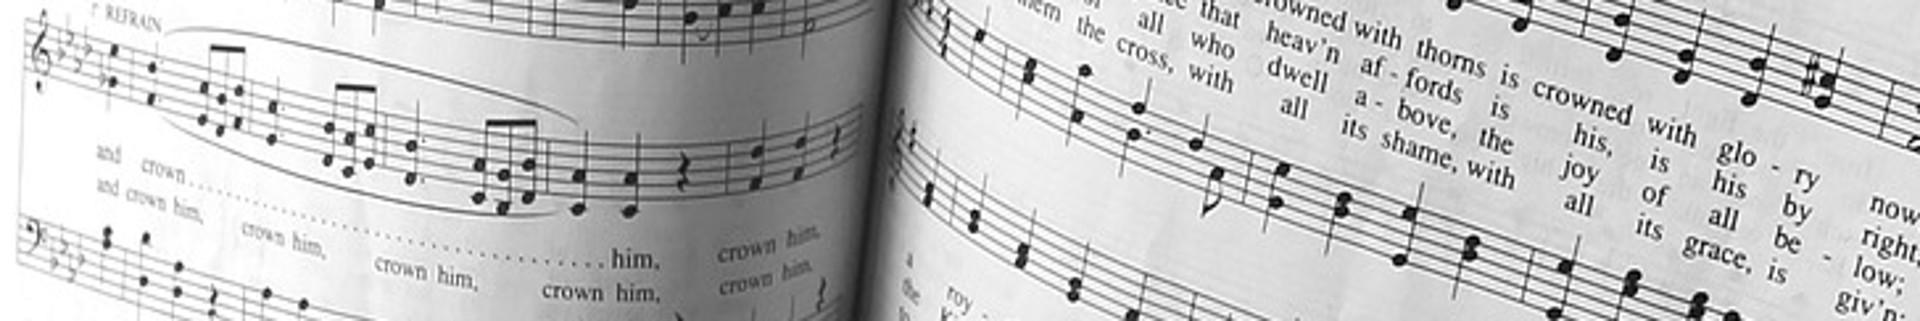 Hymn_Banner.jpg